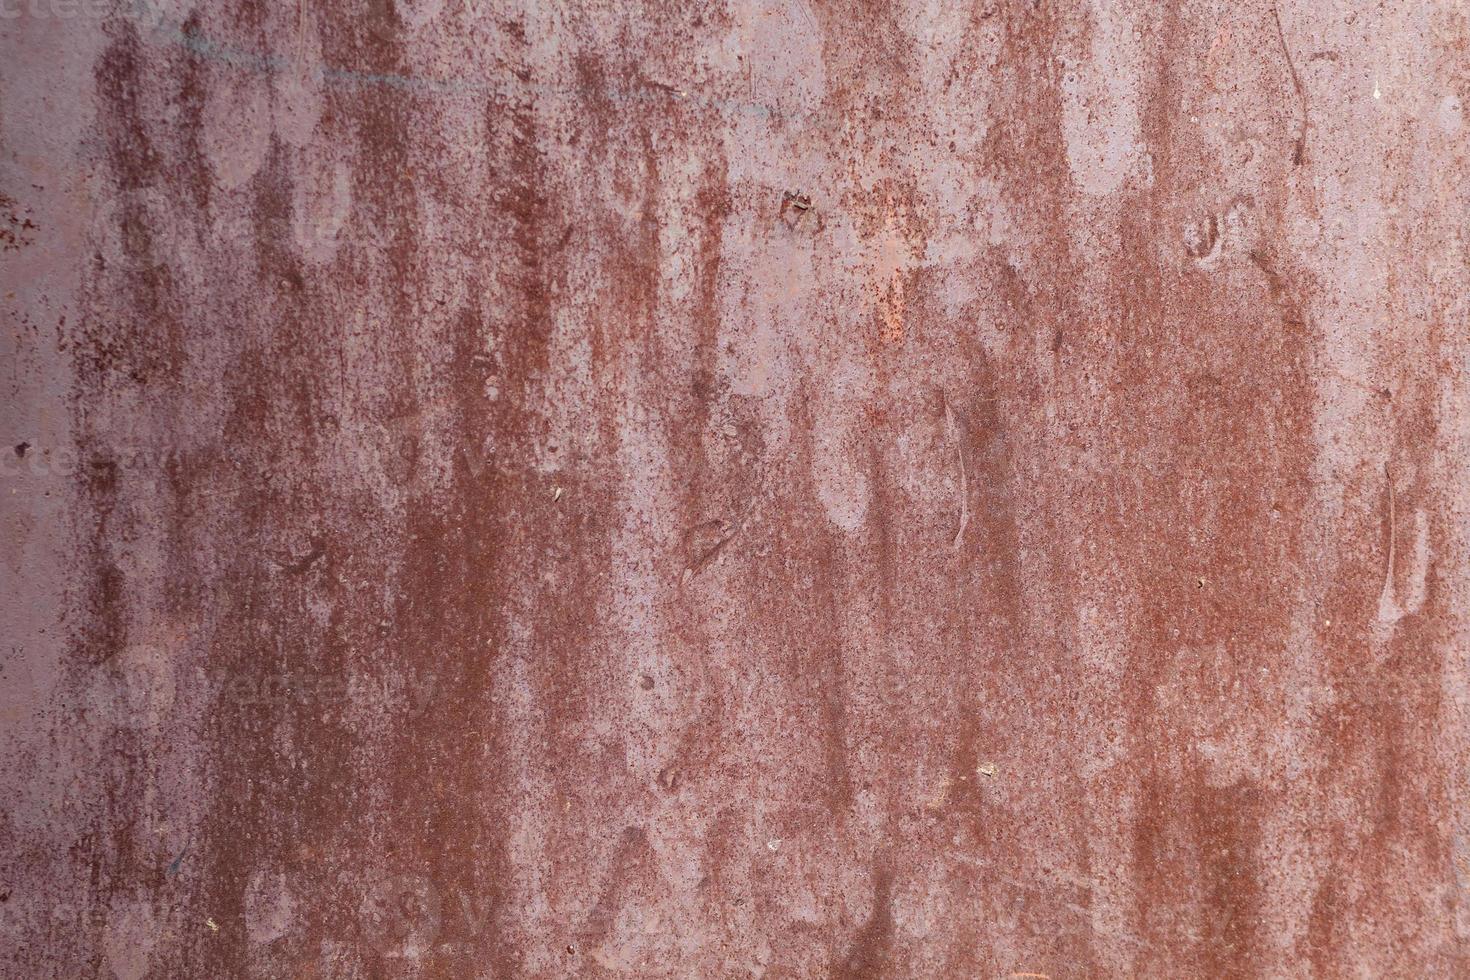 Textura de metal oxidado pintado foto